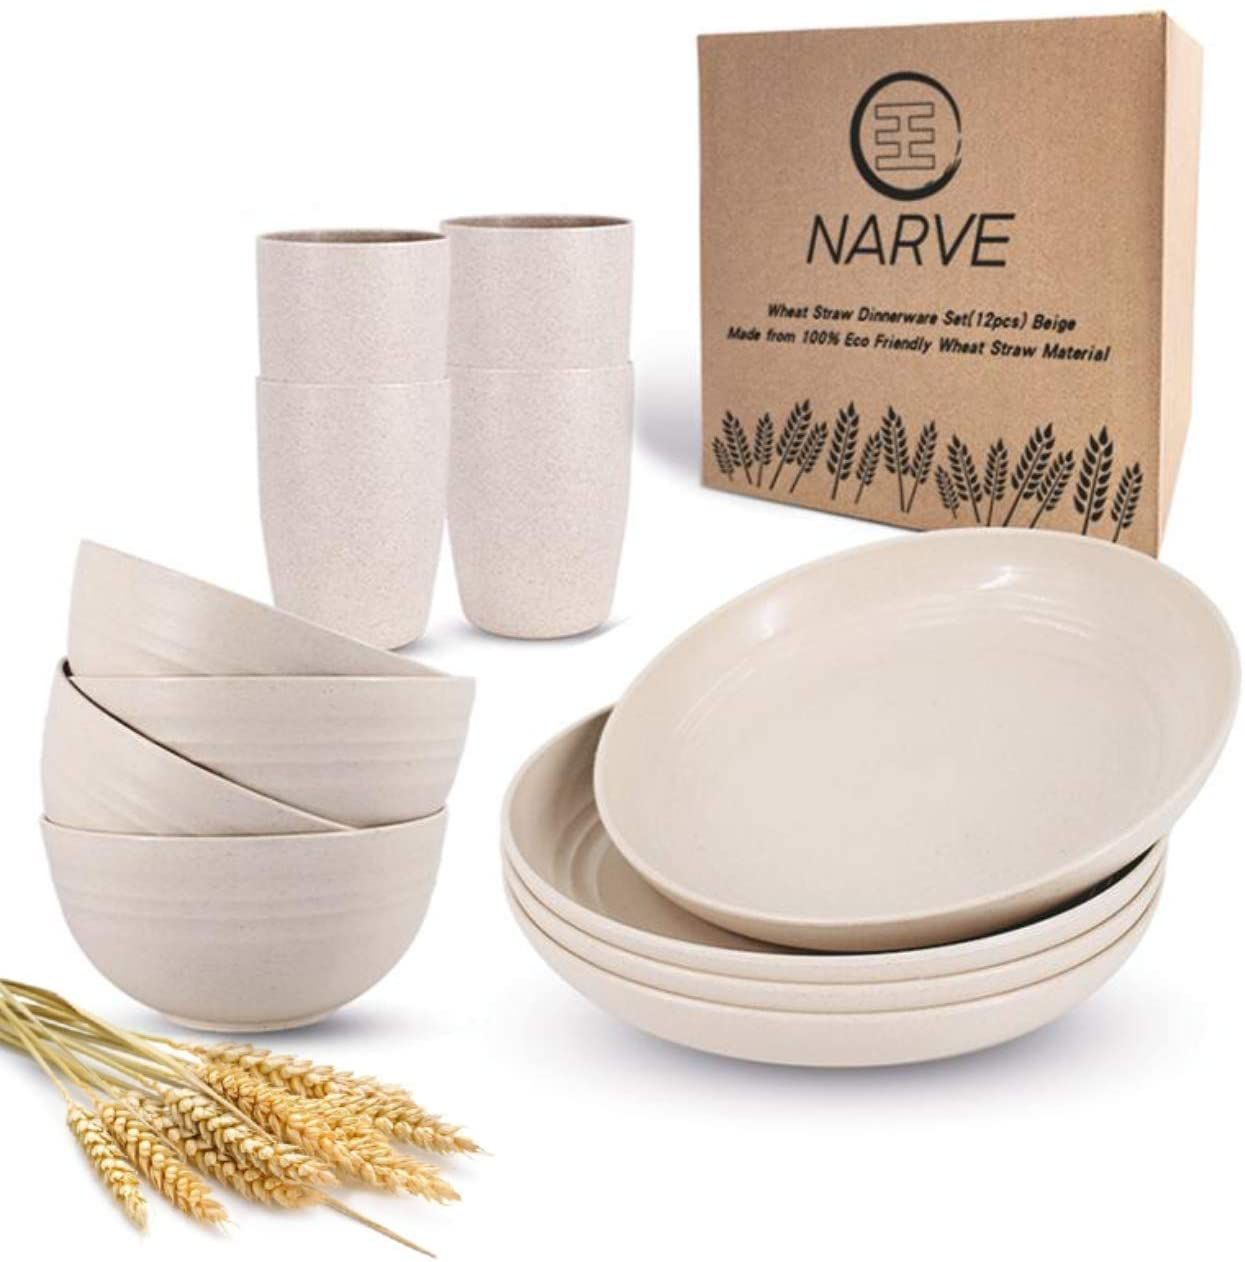 Narve Wheat Straw Dinnerware Set